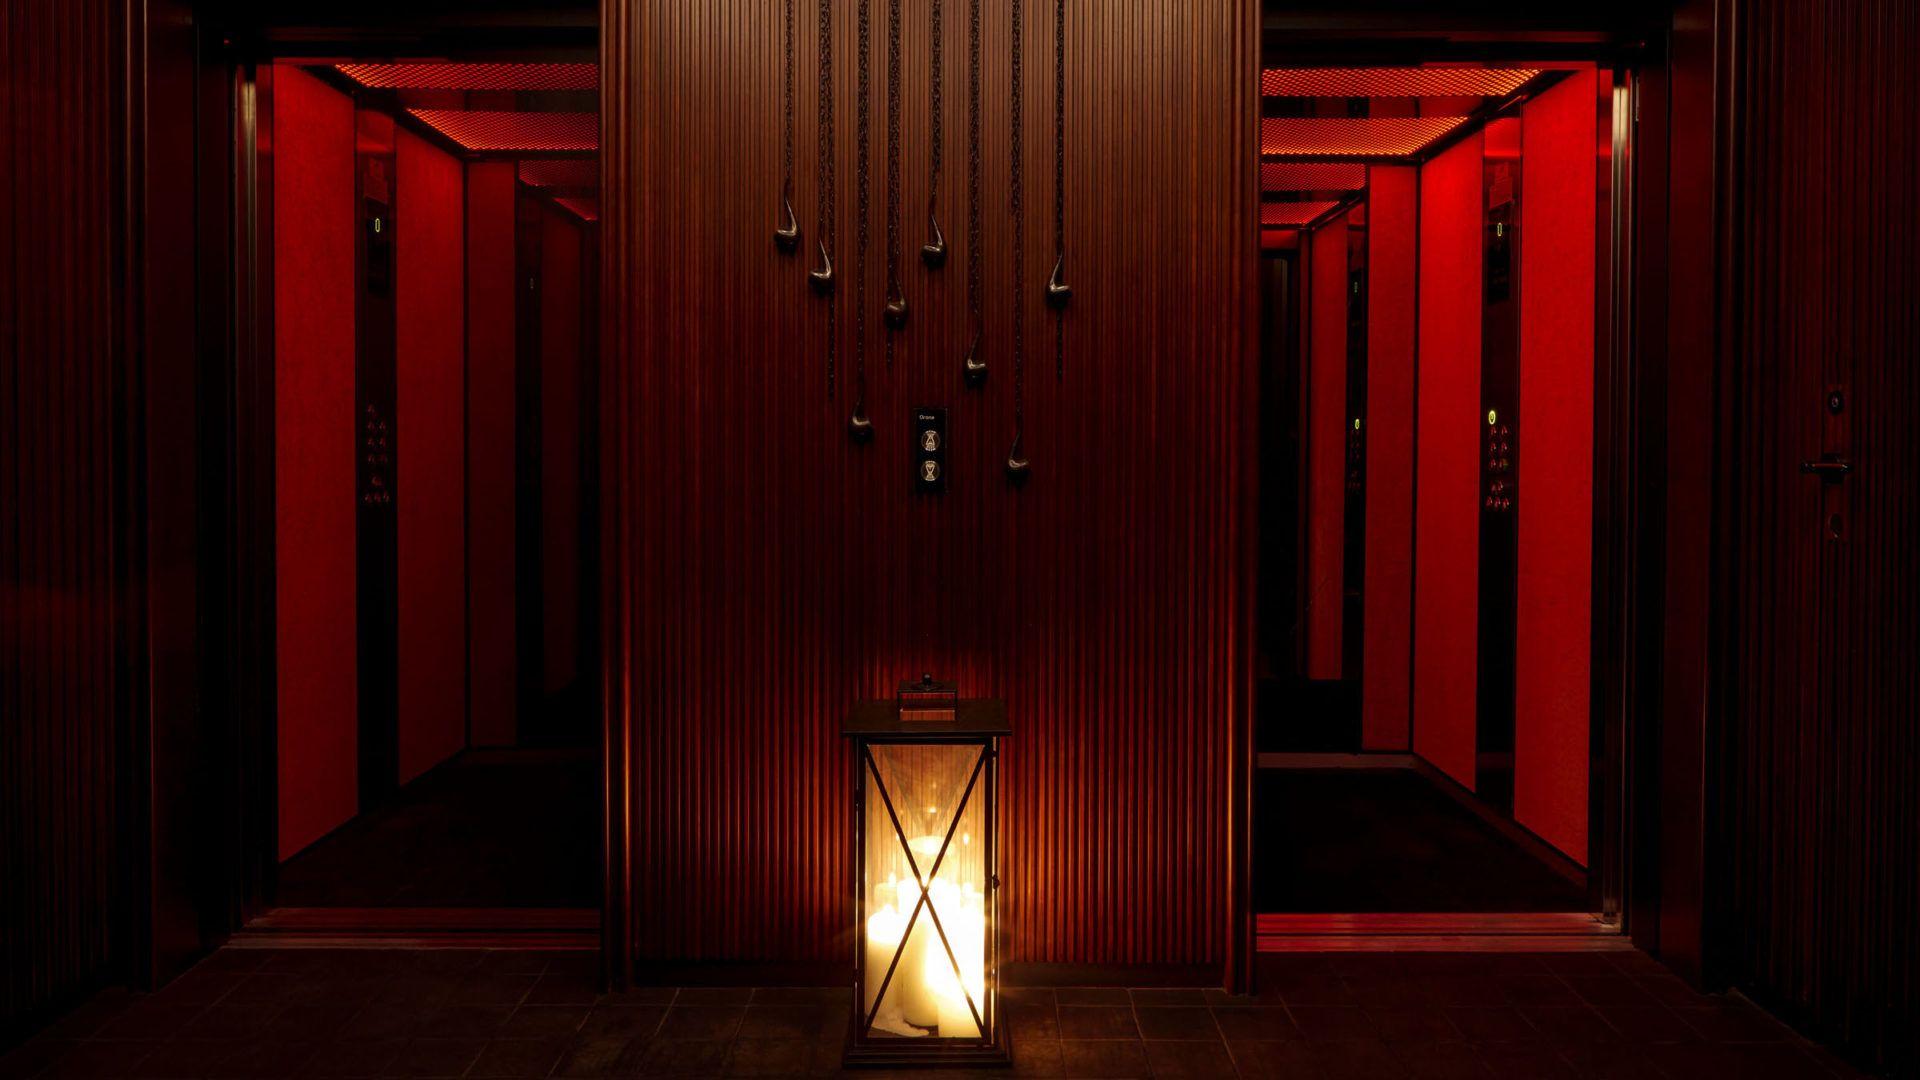 SINNER_Ascenceur_paris_marais_hotel_luxe_Nicolas_Receveur